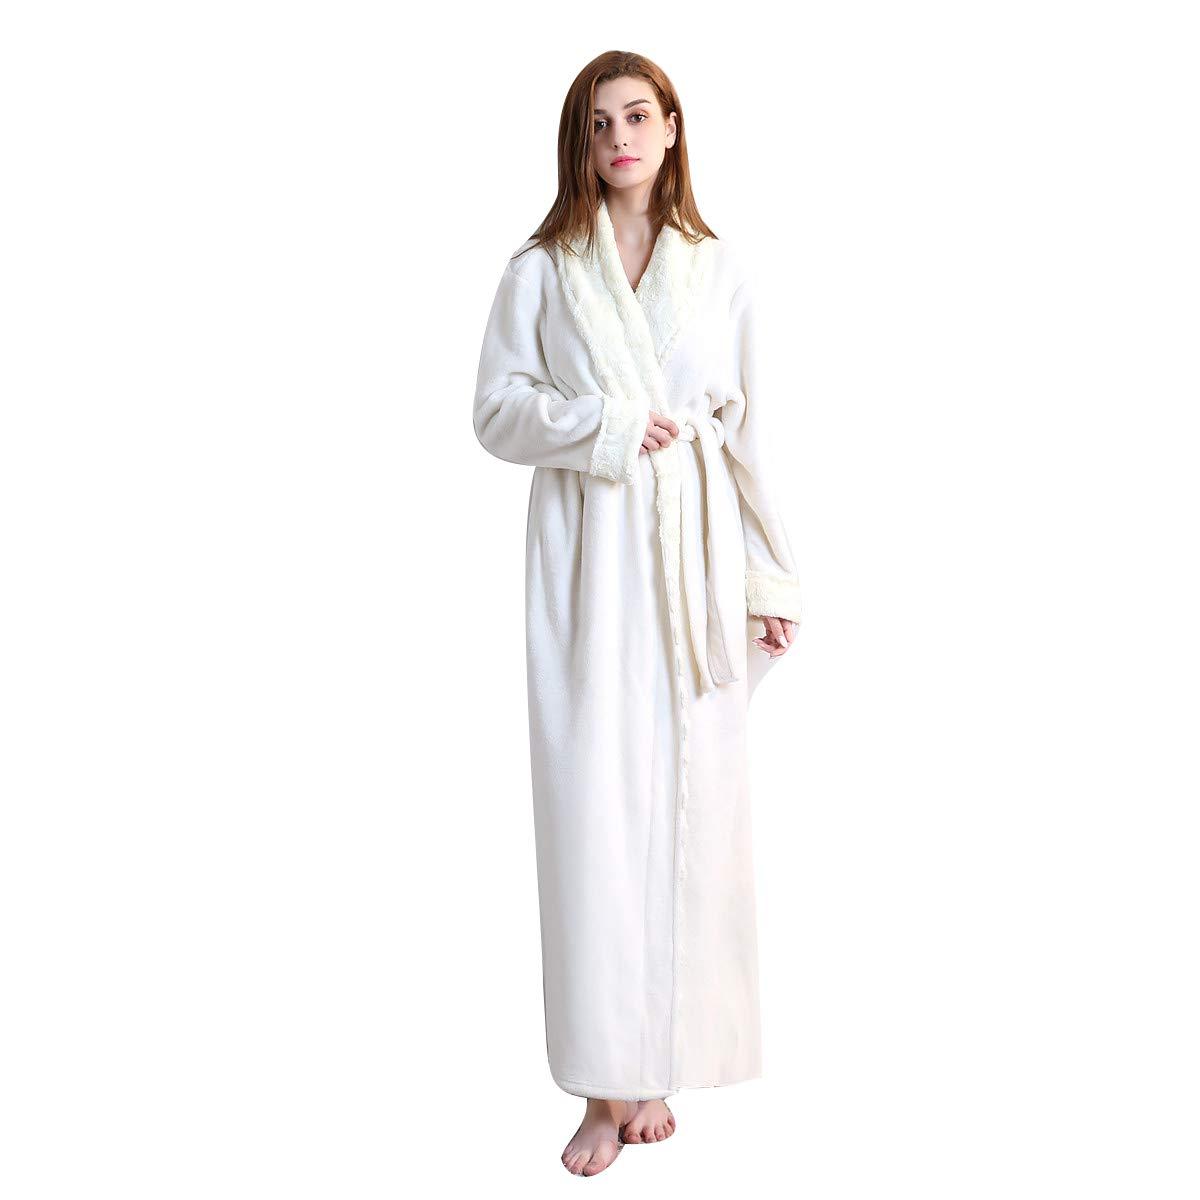 DoMii Women Long Thick Fleece Robe Soft Spa Plush Full Length Bathrobe Sleepwear